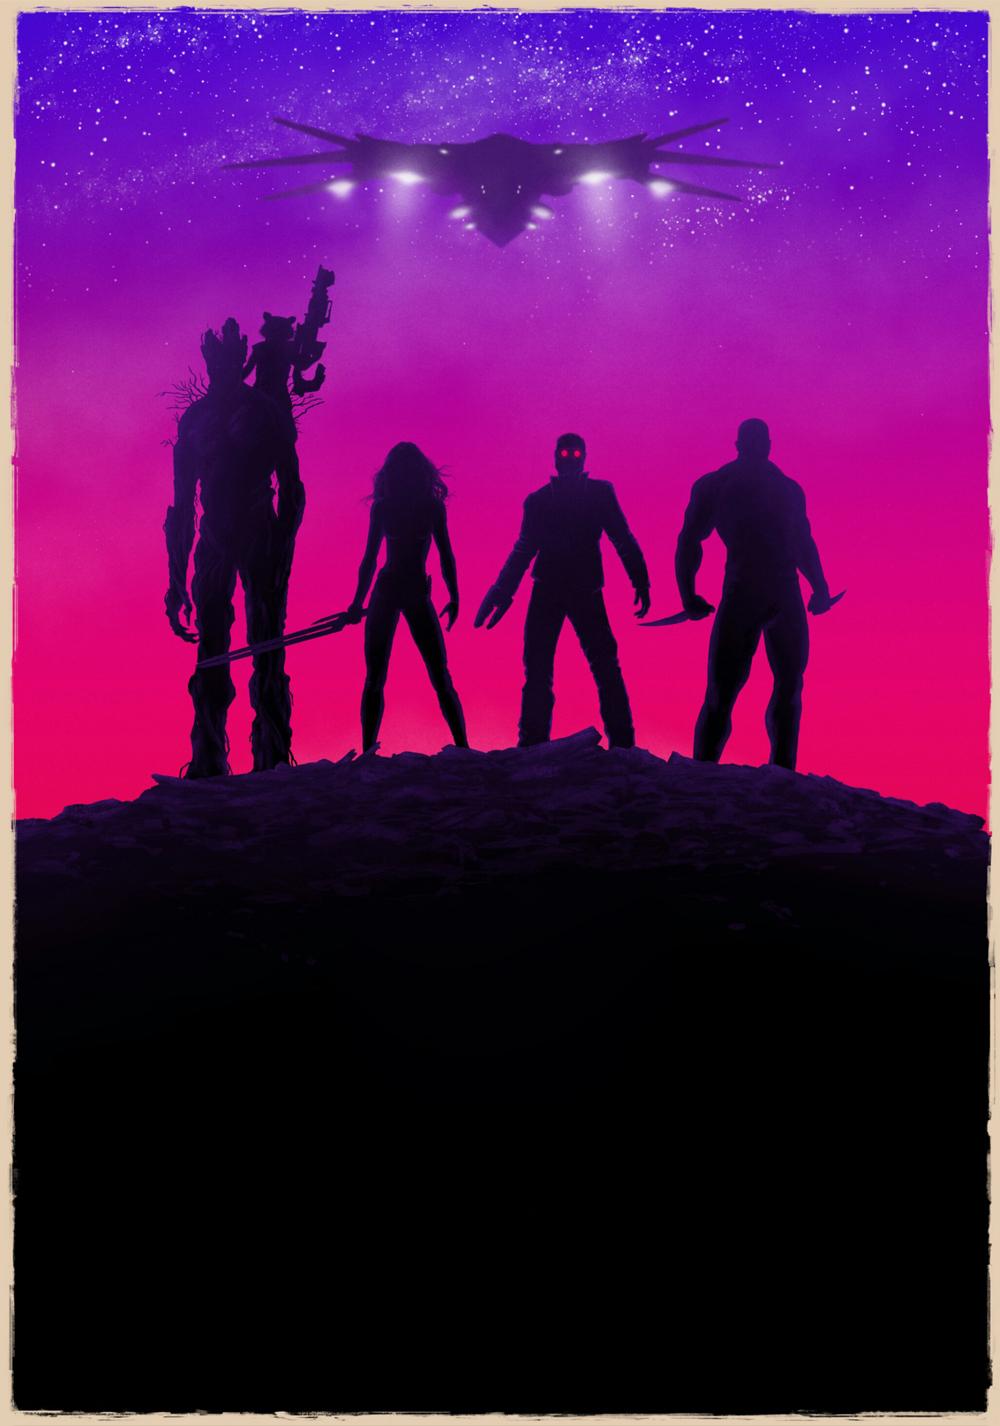 guardians of the galaxy movie fanart fanarttv